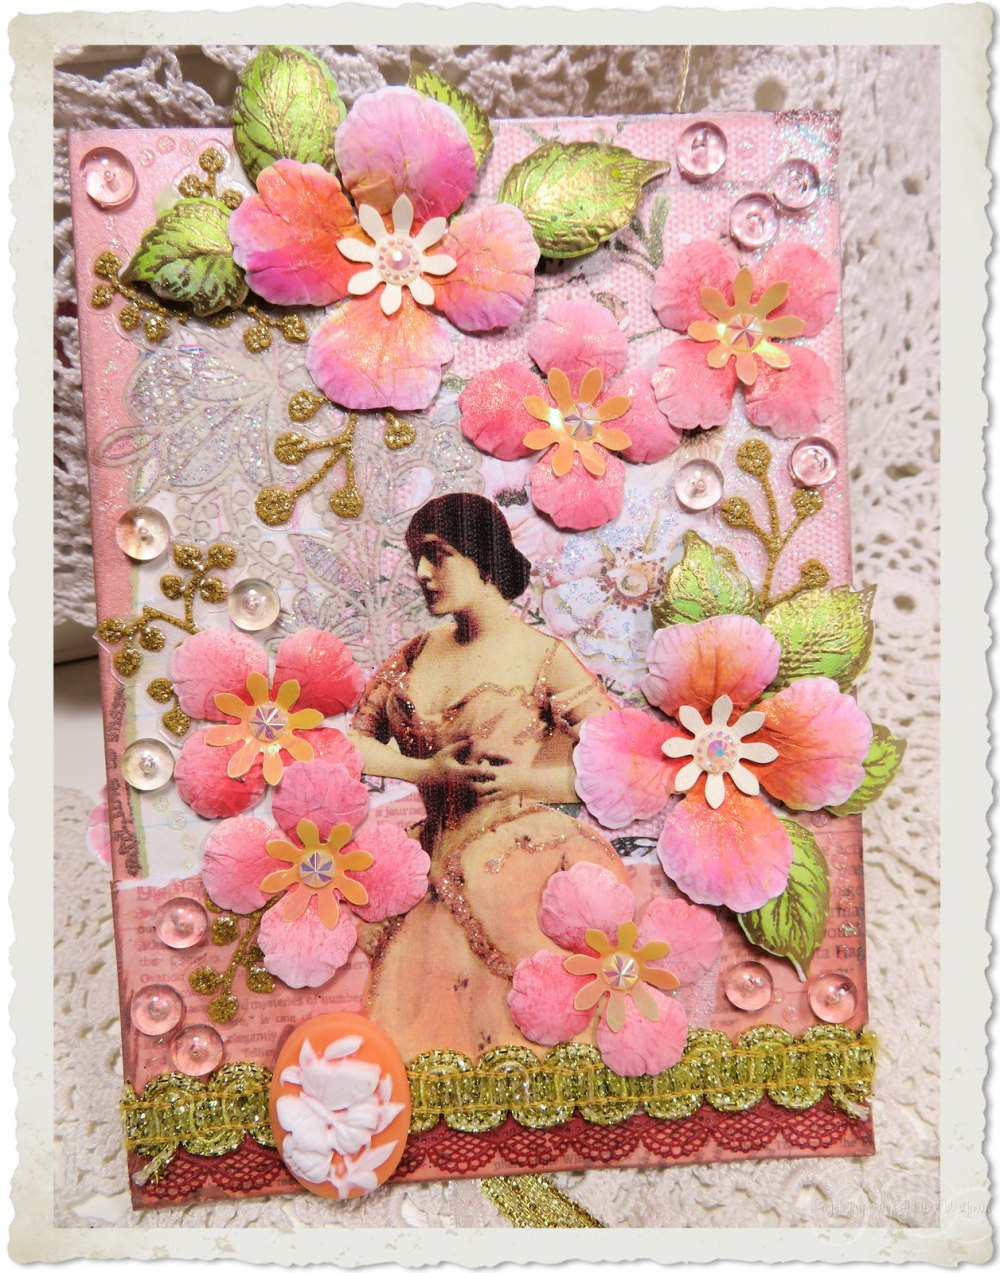 Handmade card with peach Heartfelt Creations flowers from Oakberry Lane series by Ingeborg van Zuiden